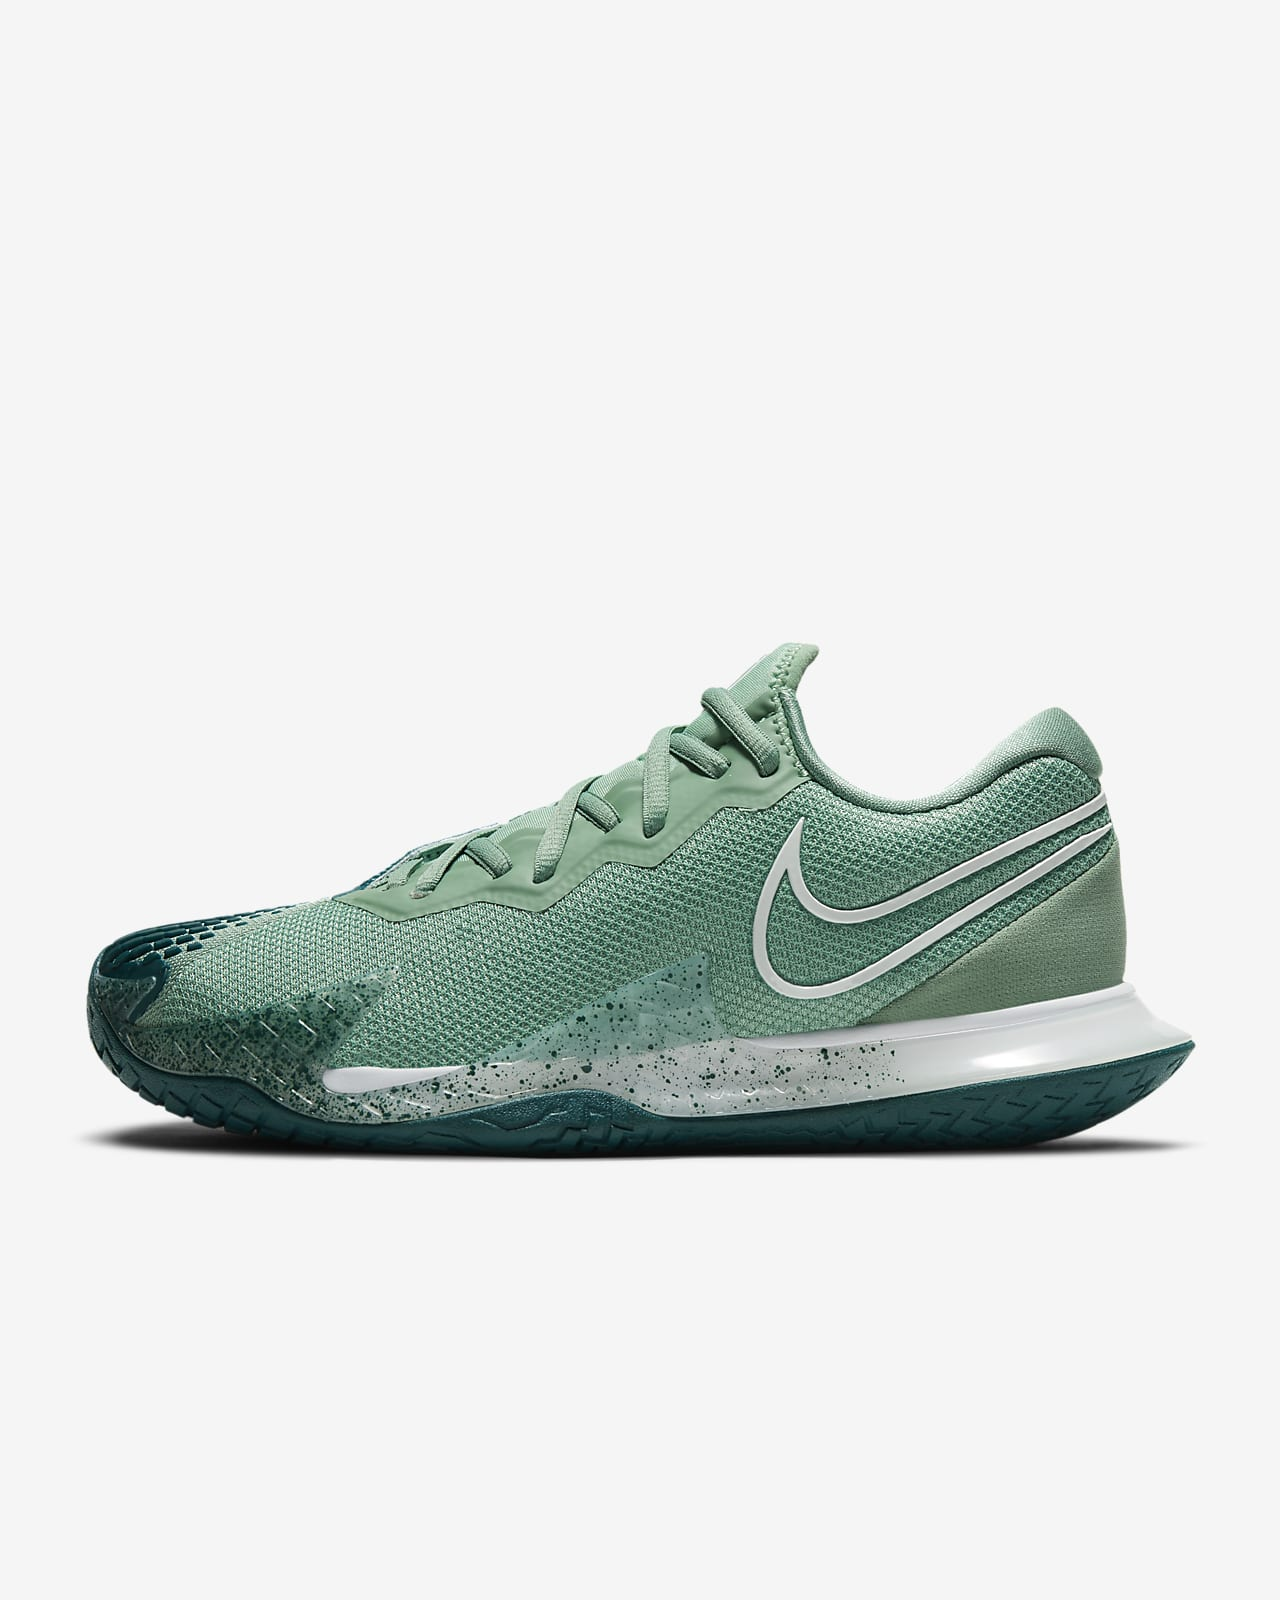 Nike Air Zoom Vapor Cage 4 HC 女子硬地球场网球鞋